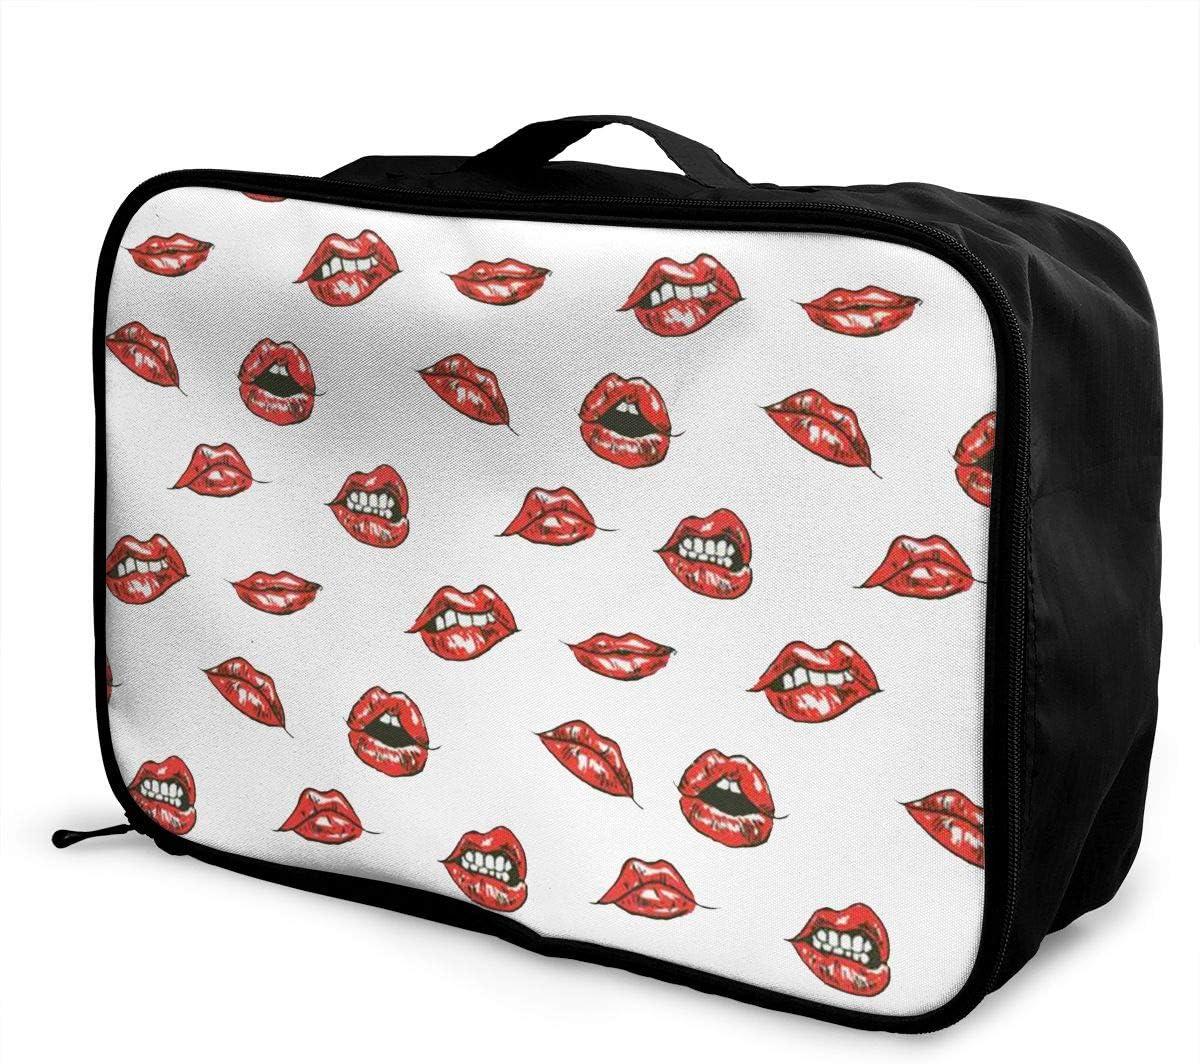 Lips Travel Carry-on Luggage Weekender Bag Overnight Tote Flight Duffel In Trolley Handle